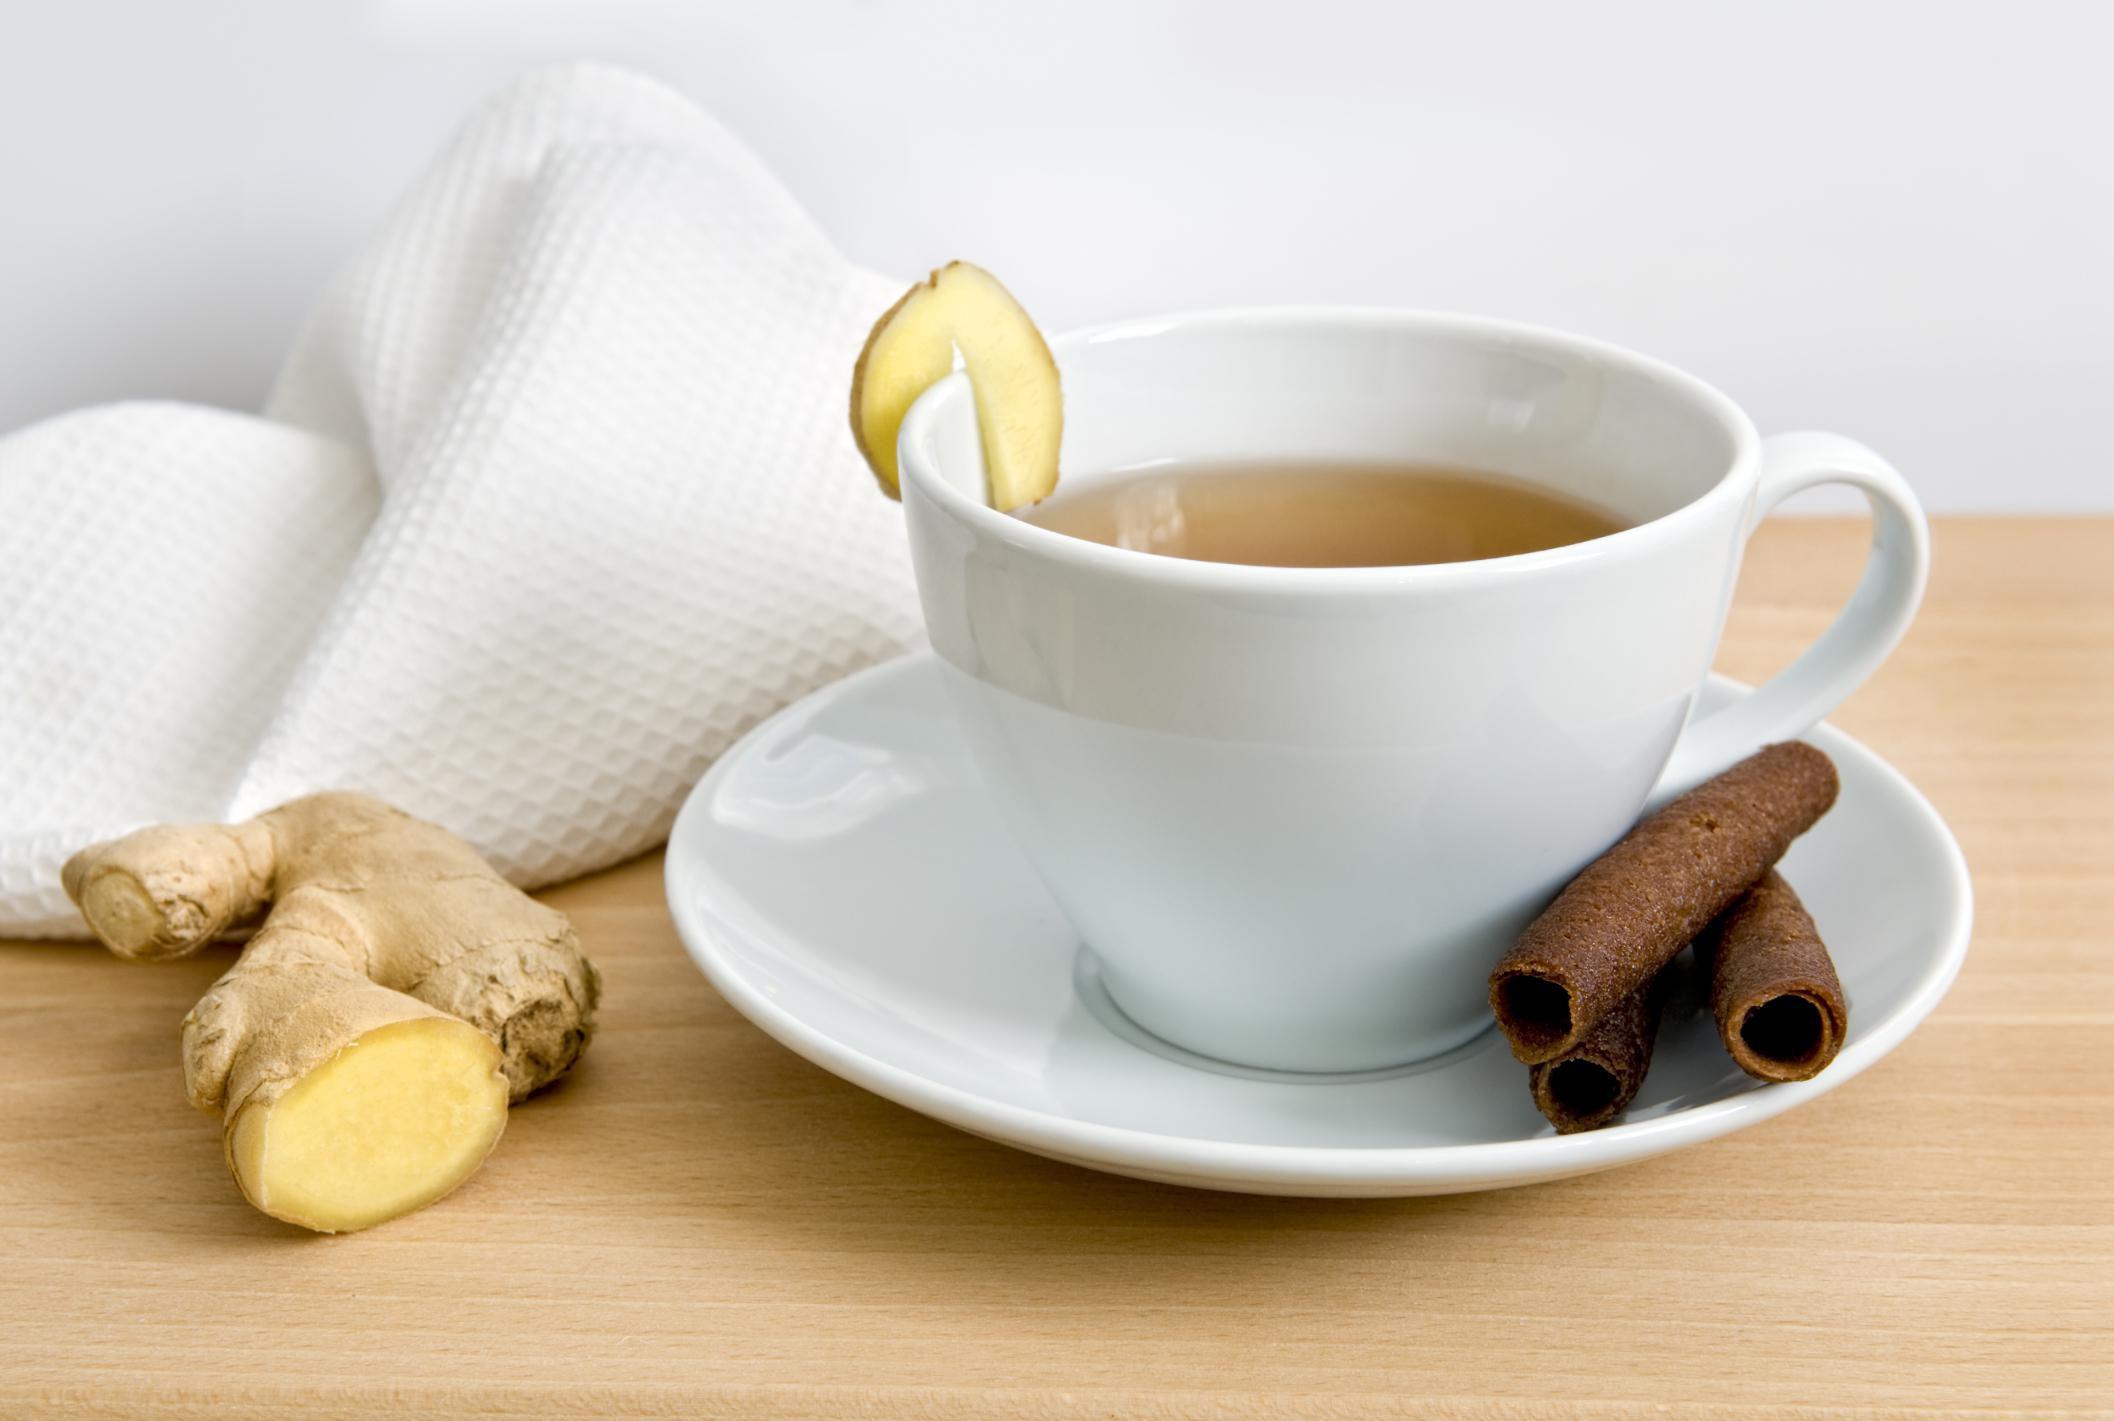 8 Best Detox Teas For Health And Enjoyment